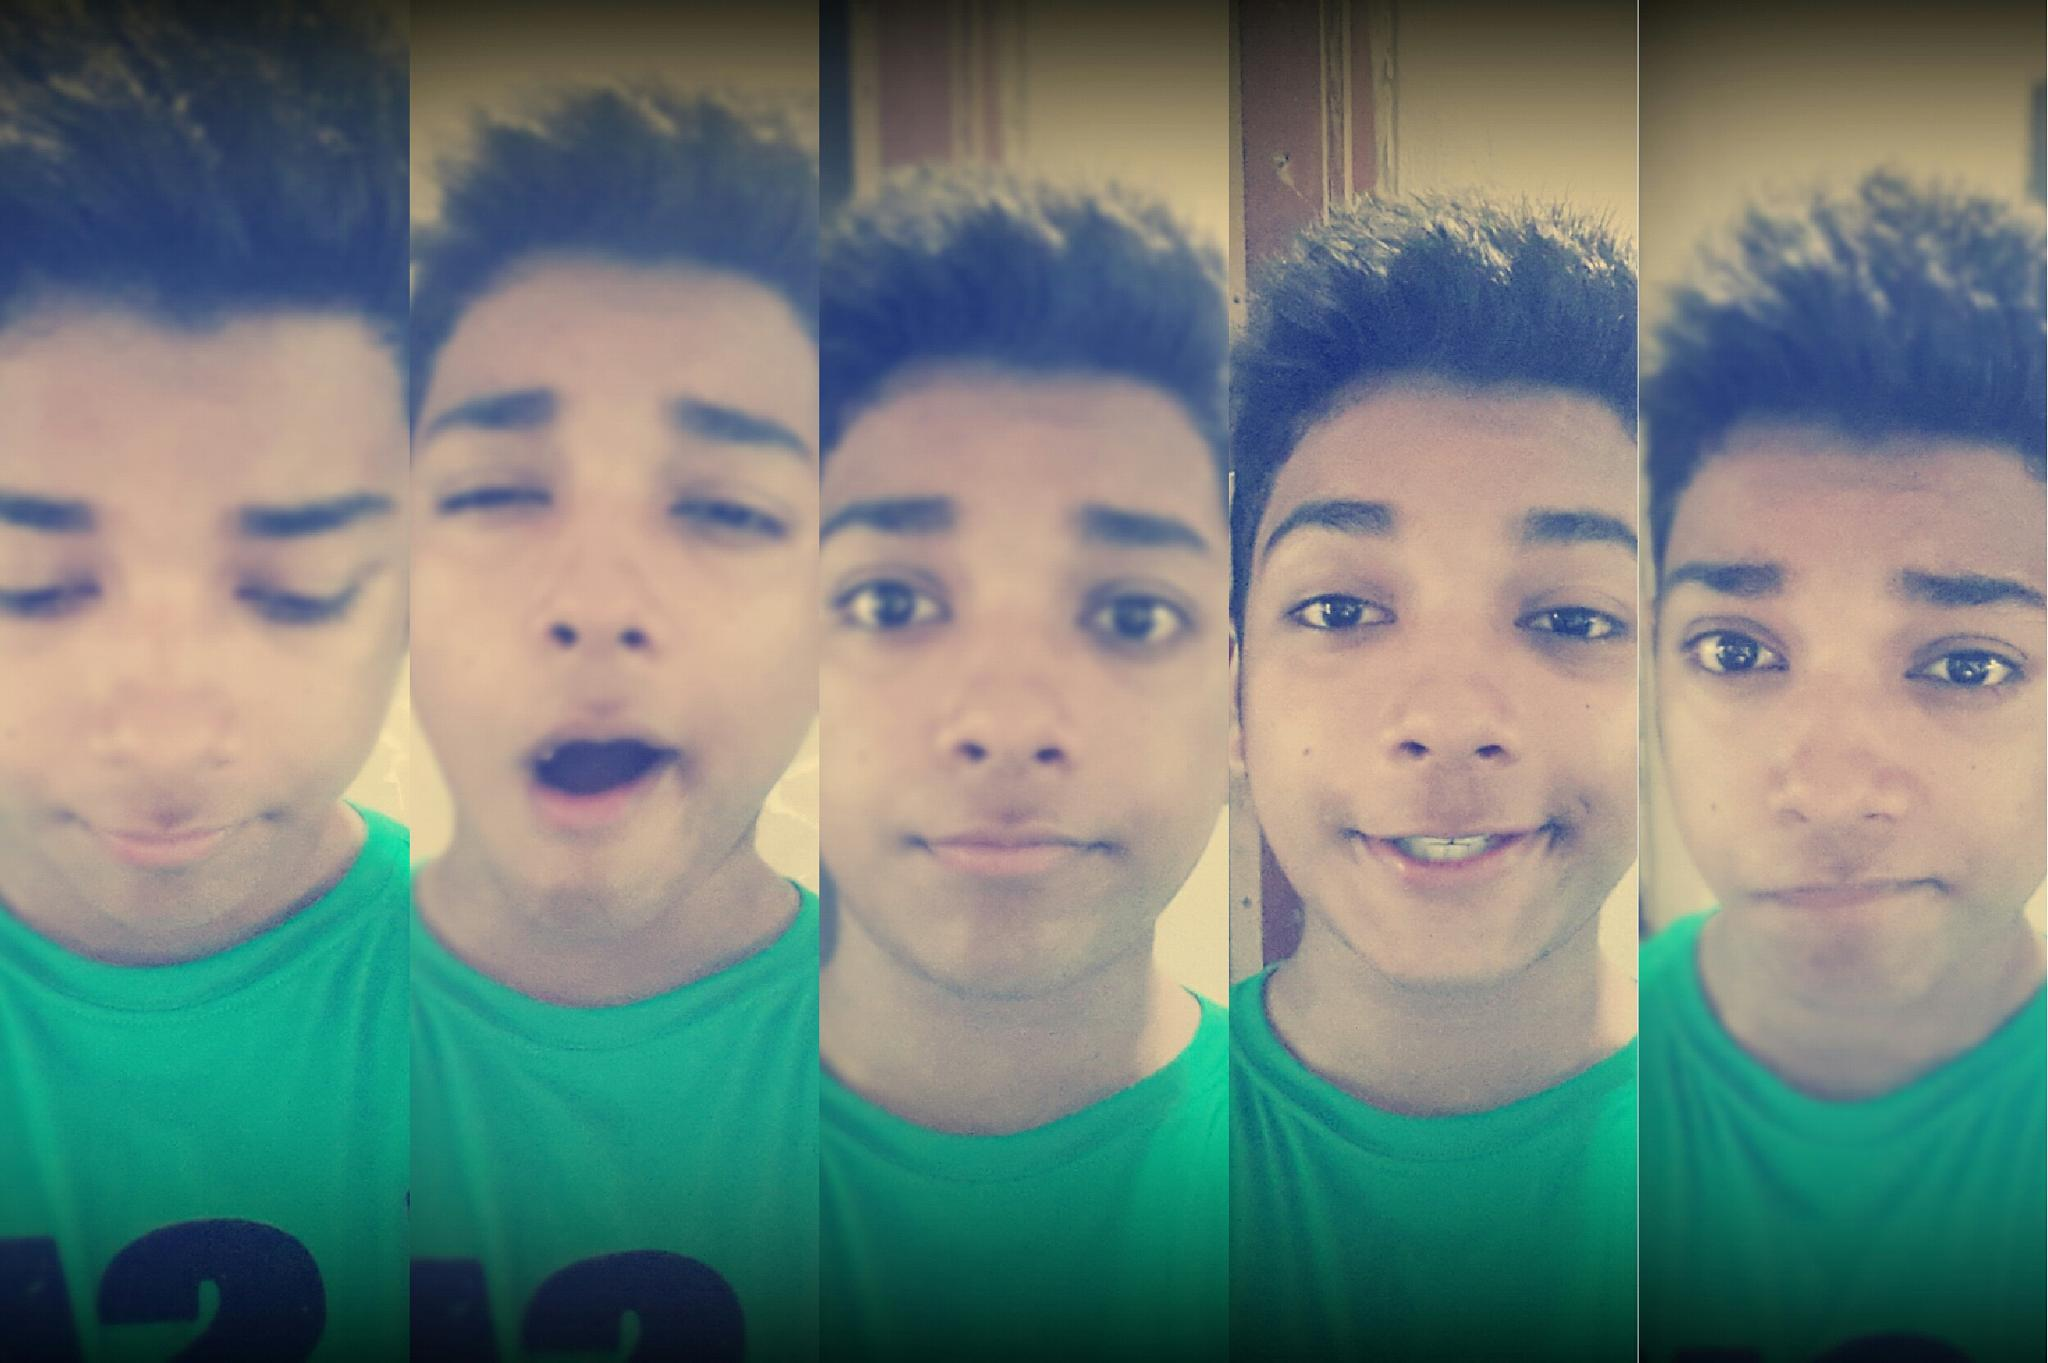 Me :-) by Hossain Spesufie